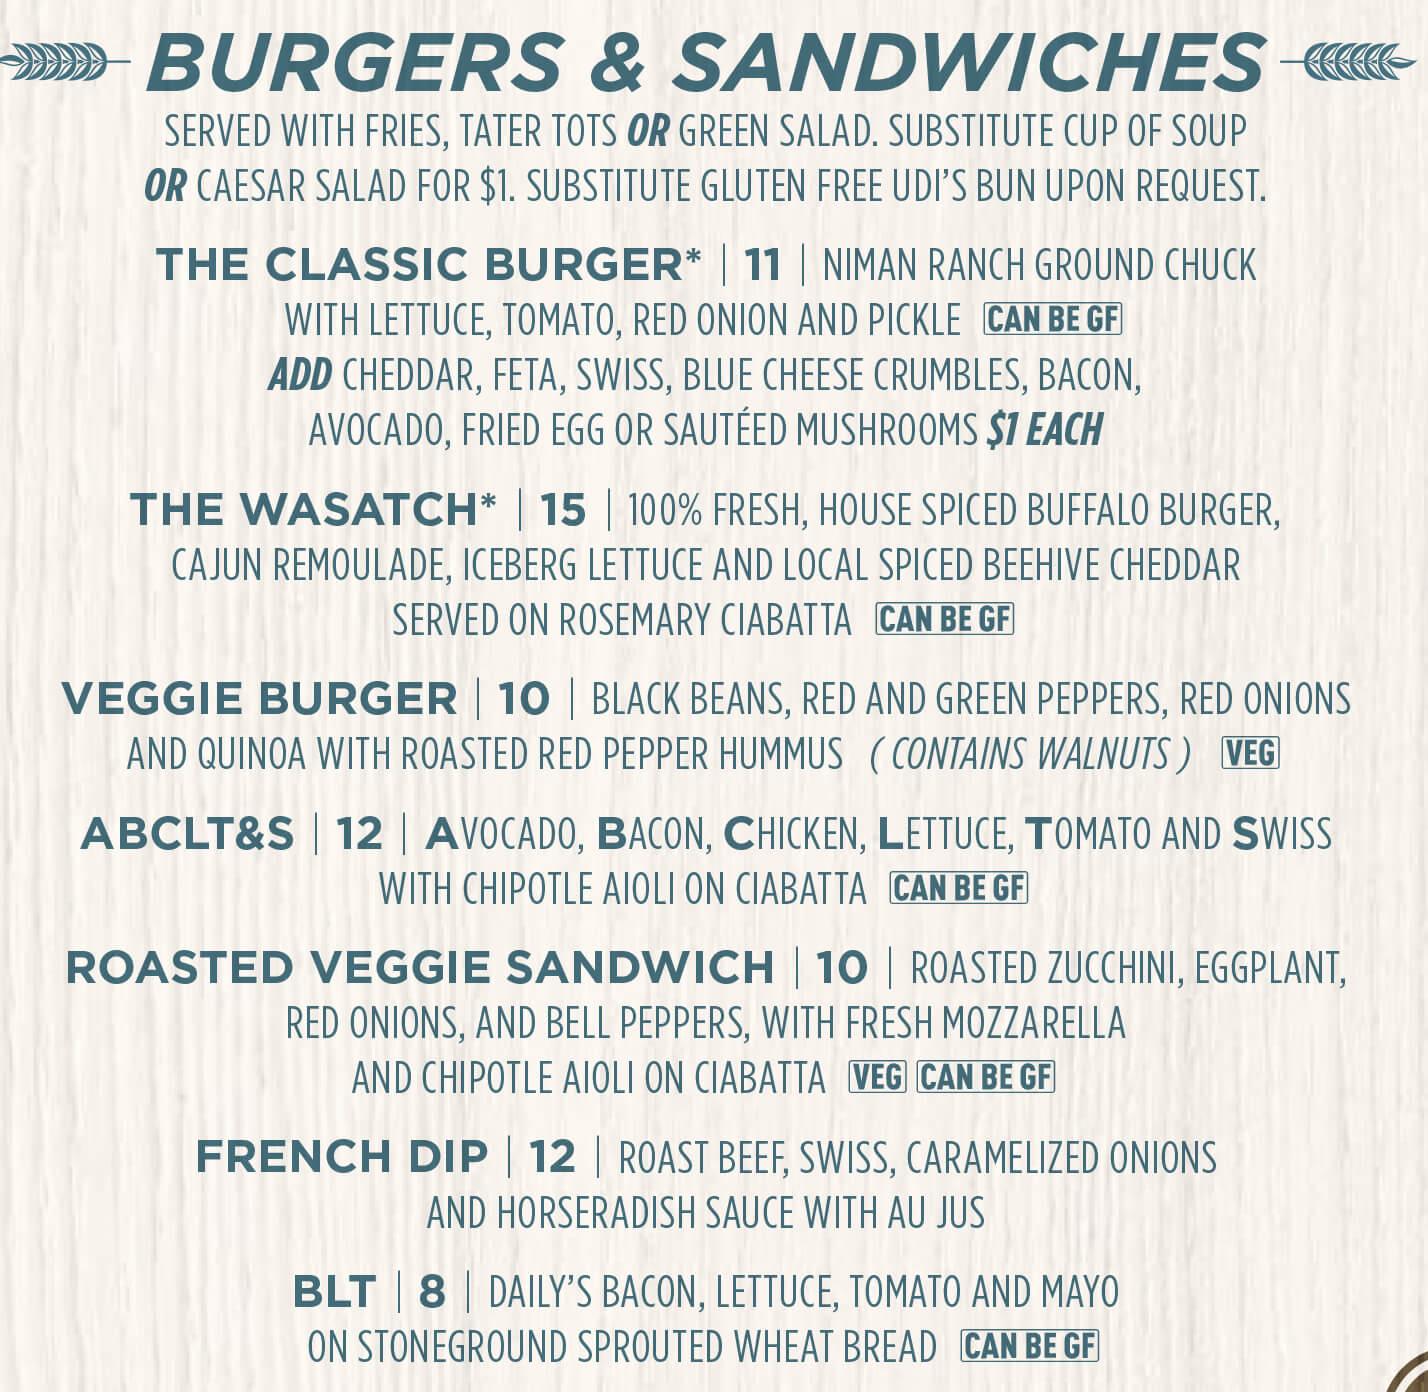 Wasatch Brew Pub Sugarhouse Brunch burgers & sandwiches menu